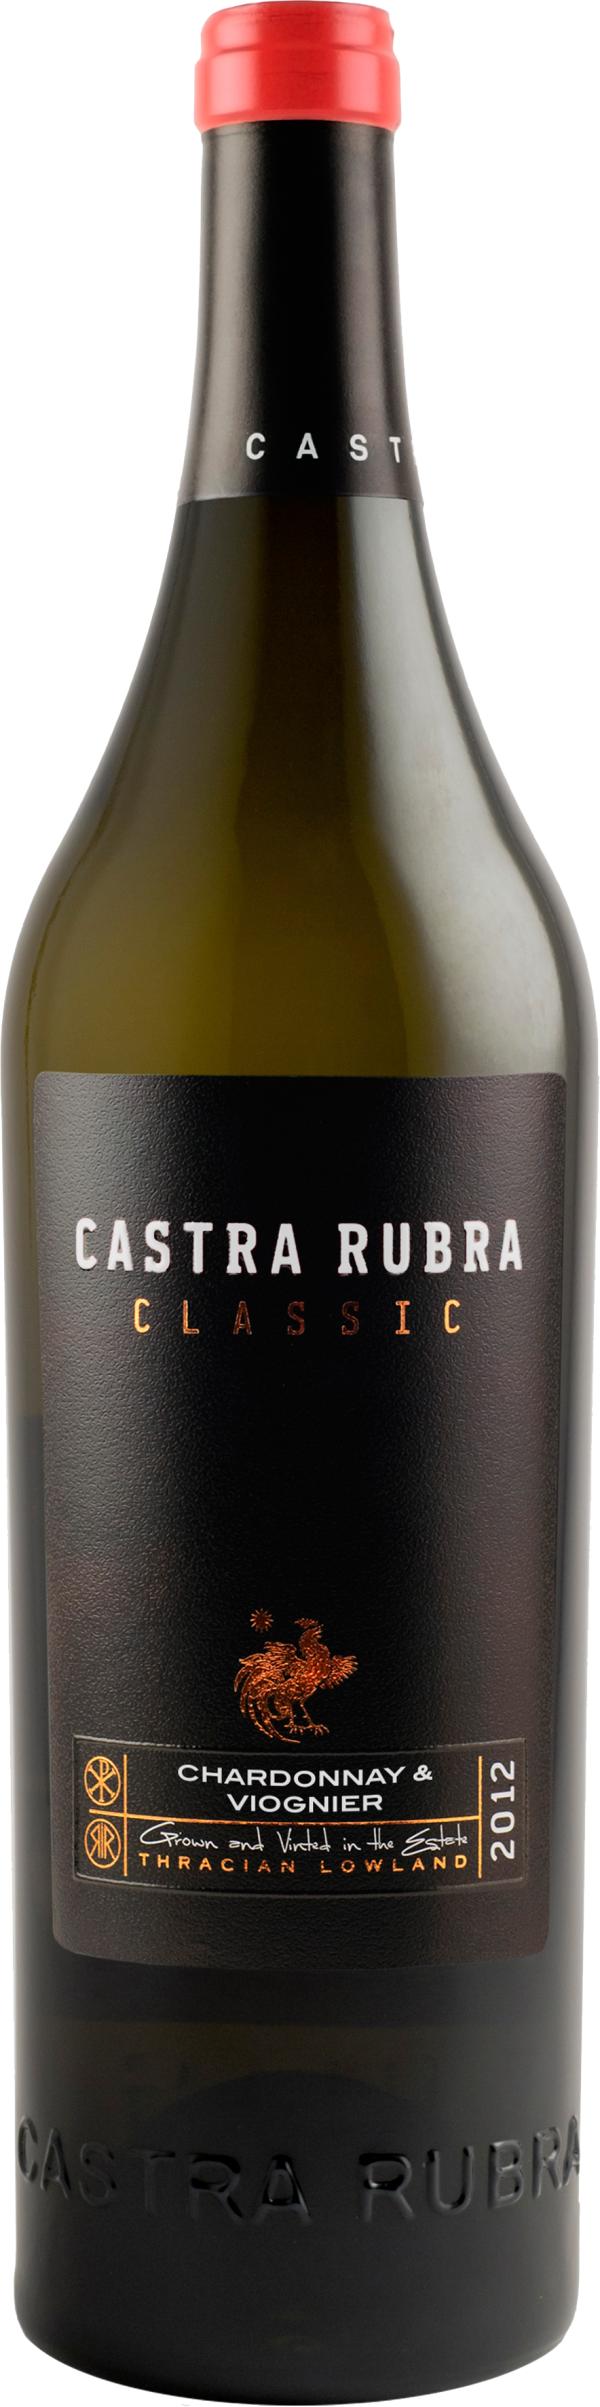 Бяло Вино Кастра Рубра Шардоне 0.375 л